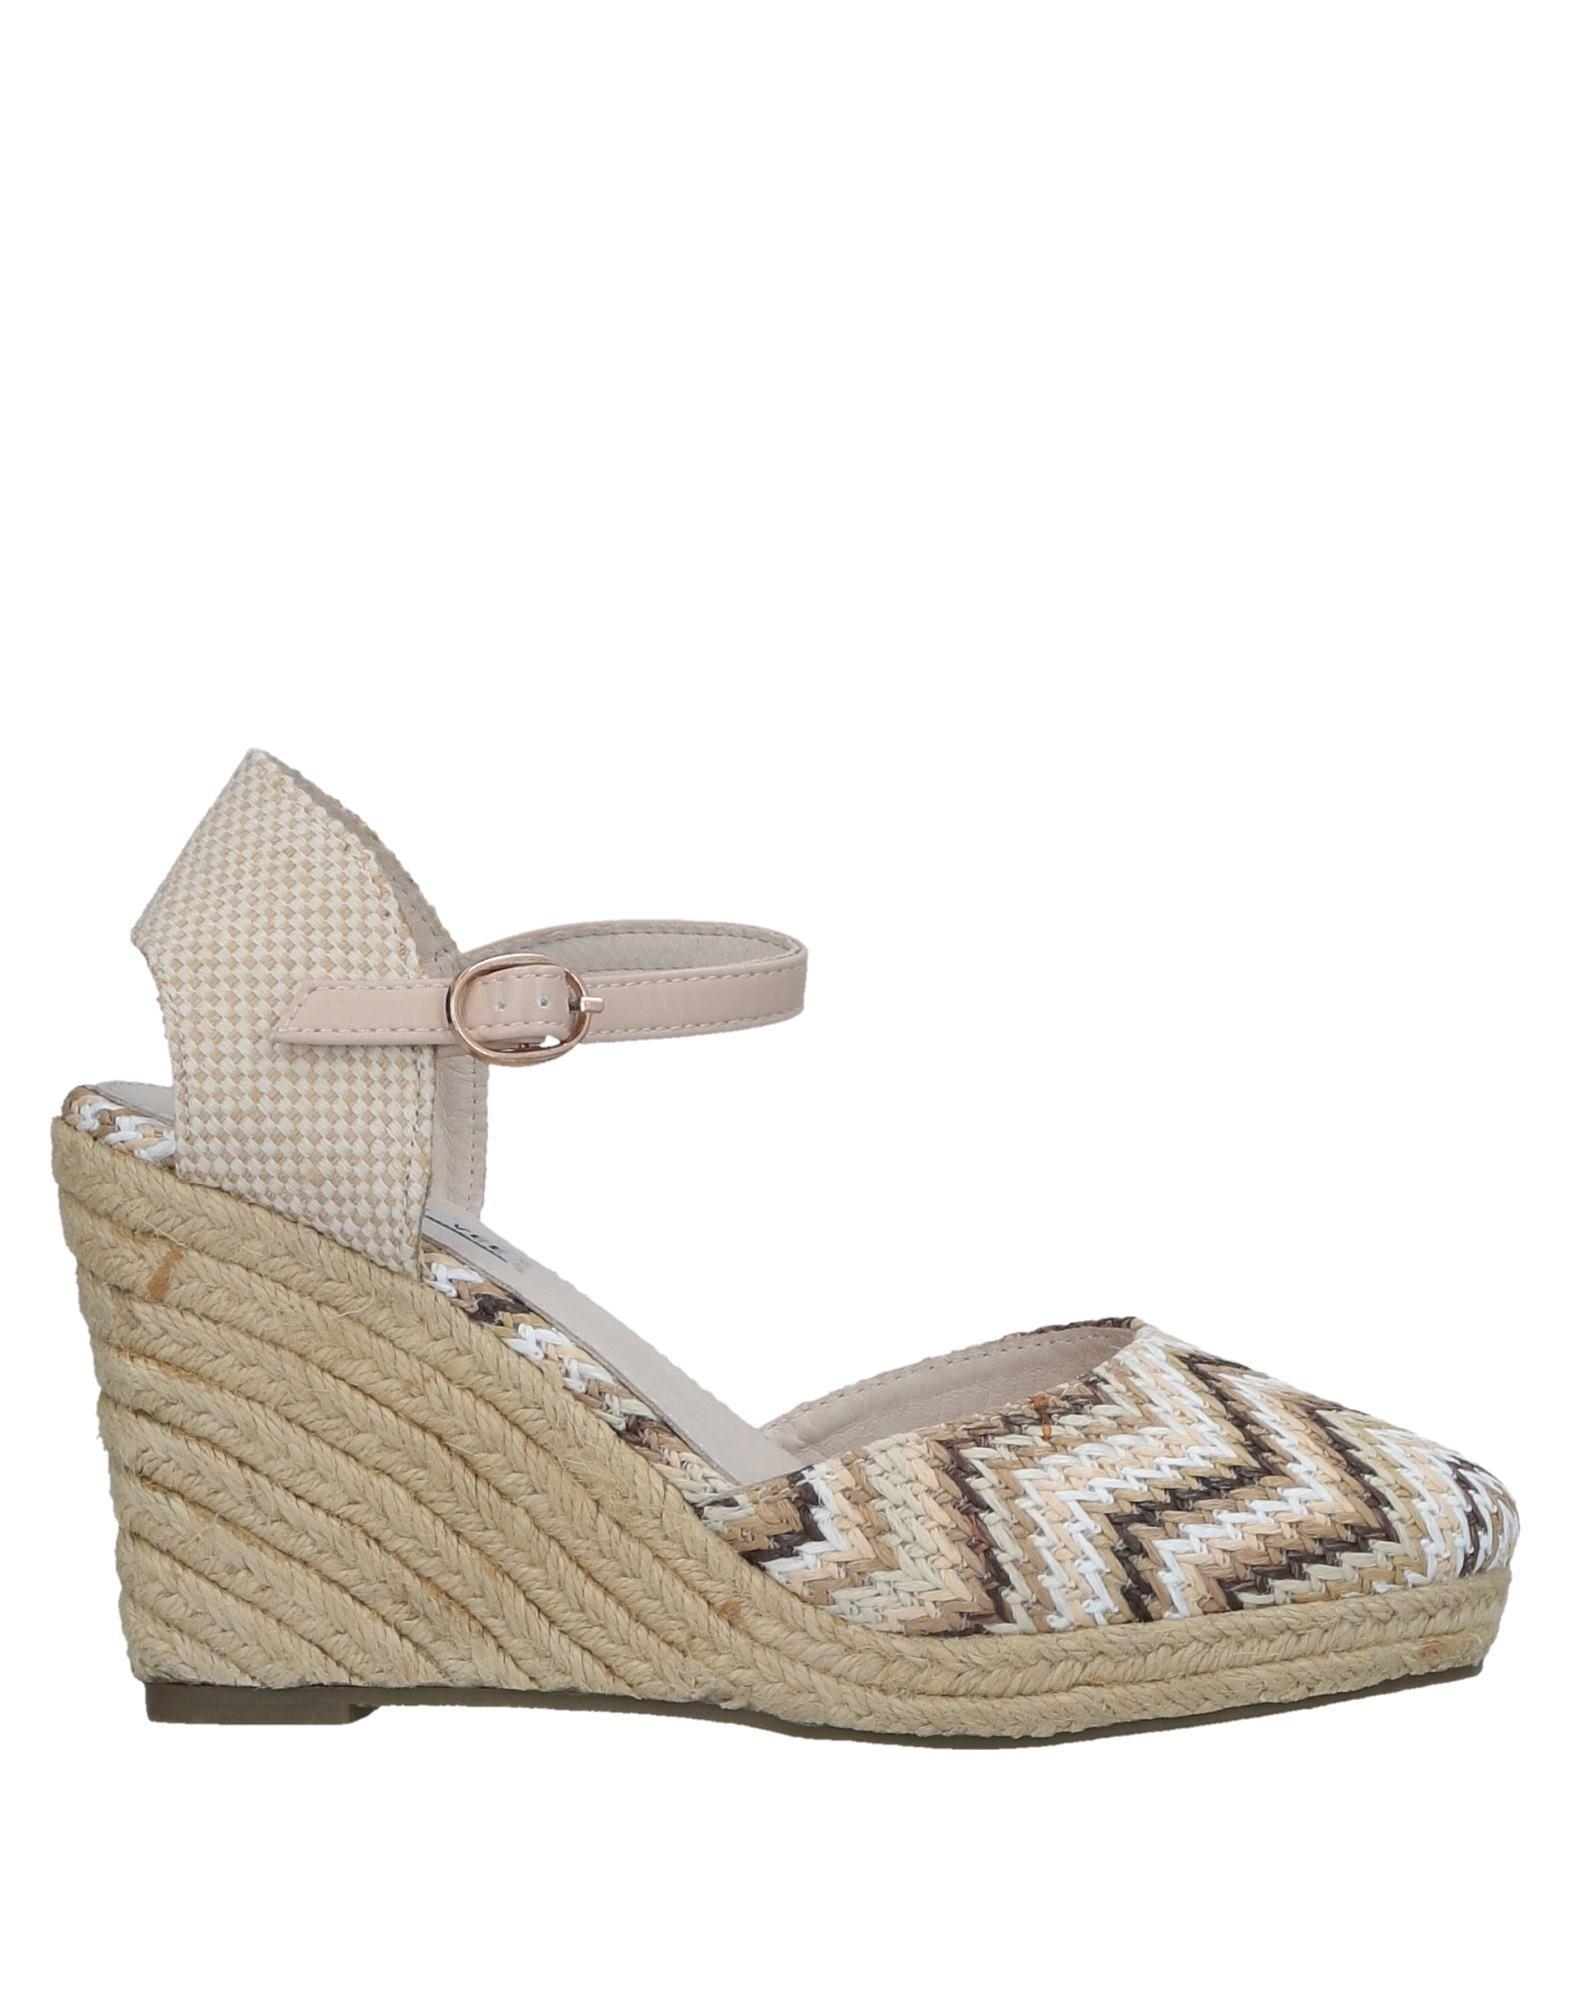 Emanuélle Vee Espadrilles Damen  Schuhe 11330089ED Gute Qualität beliebte Schuhe  25ff06